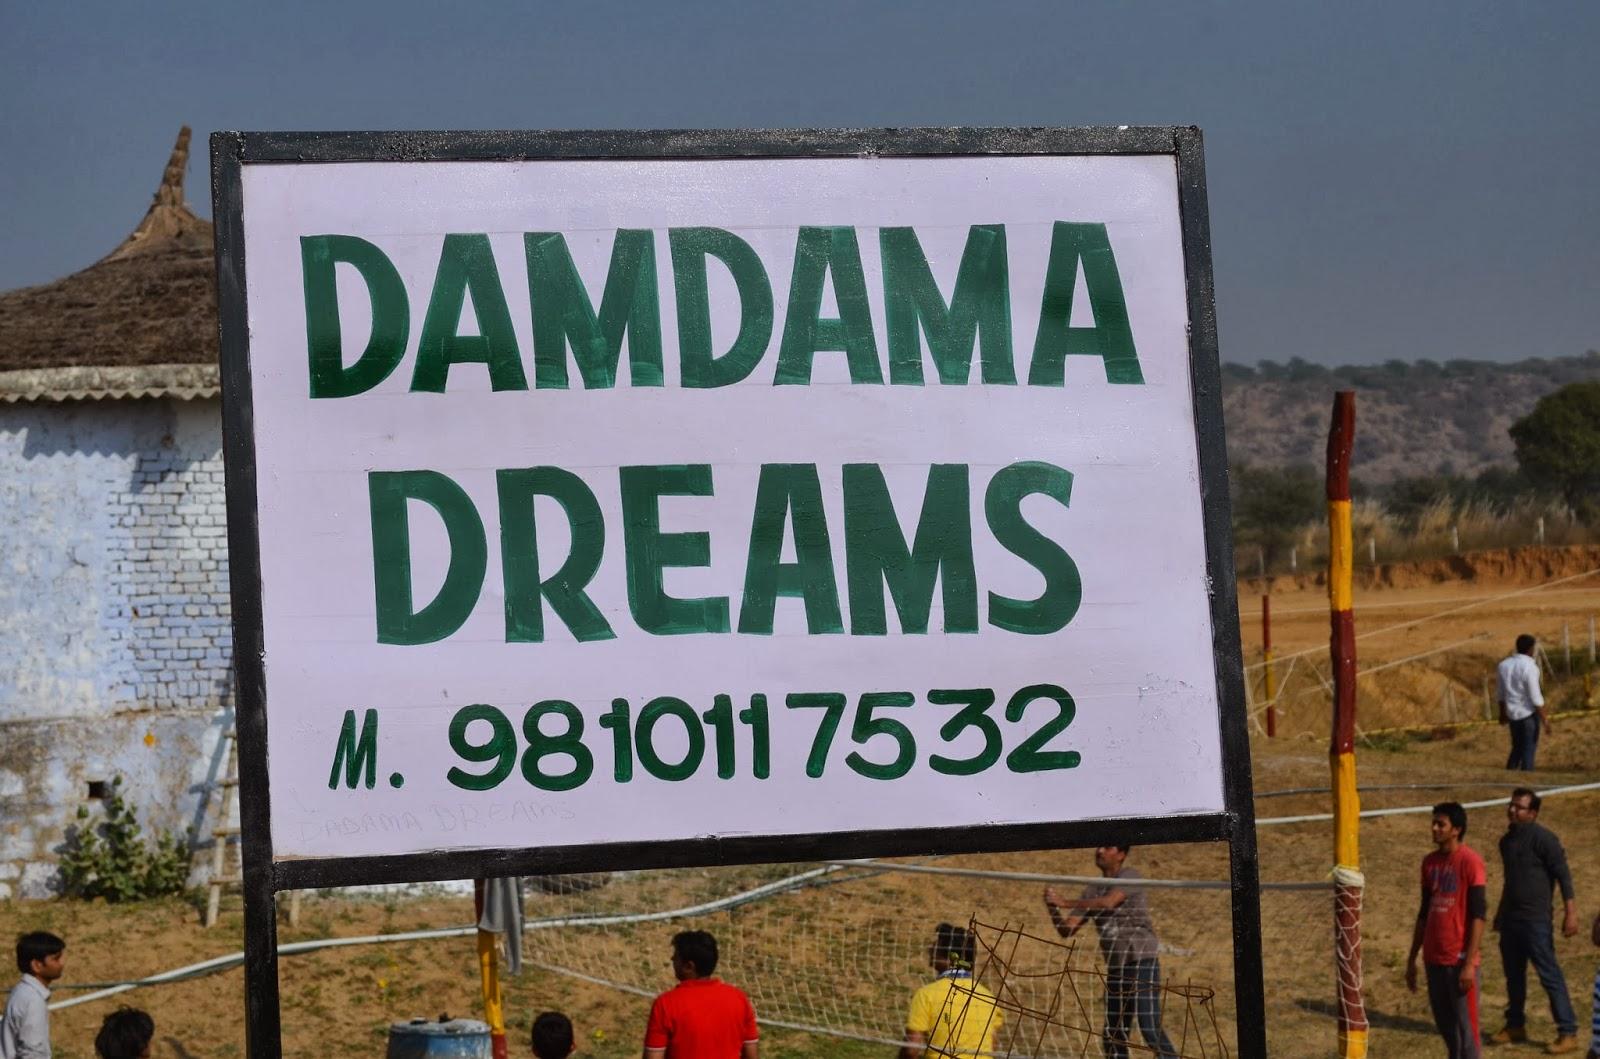 Damdama Dreams